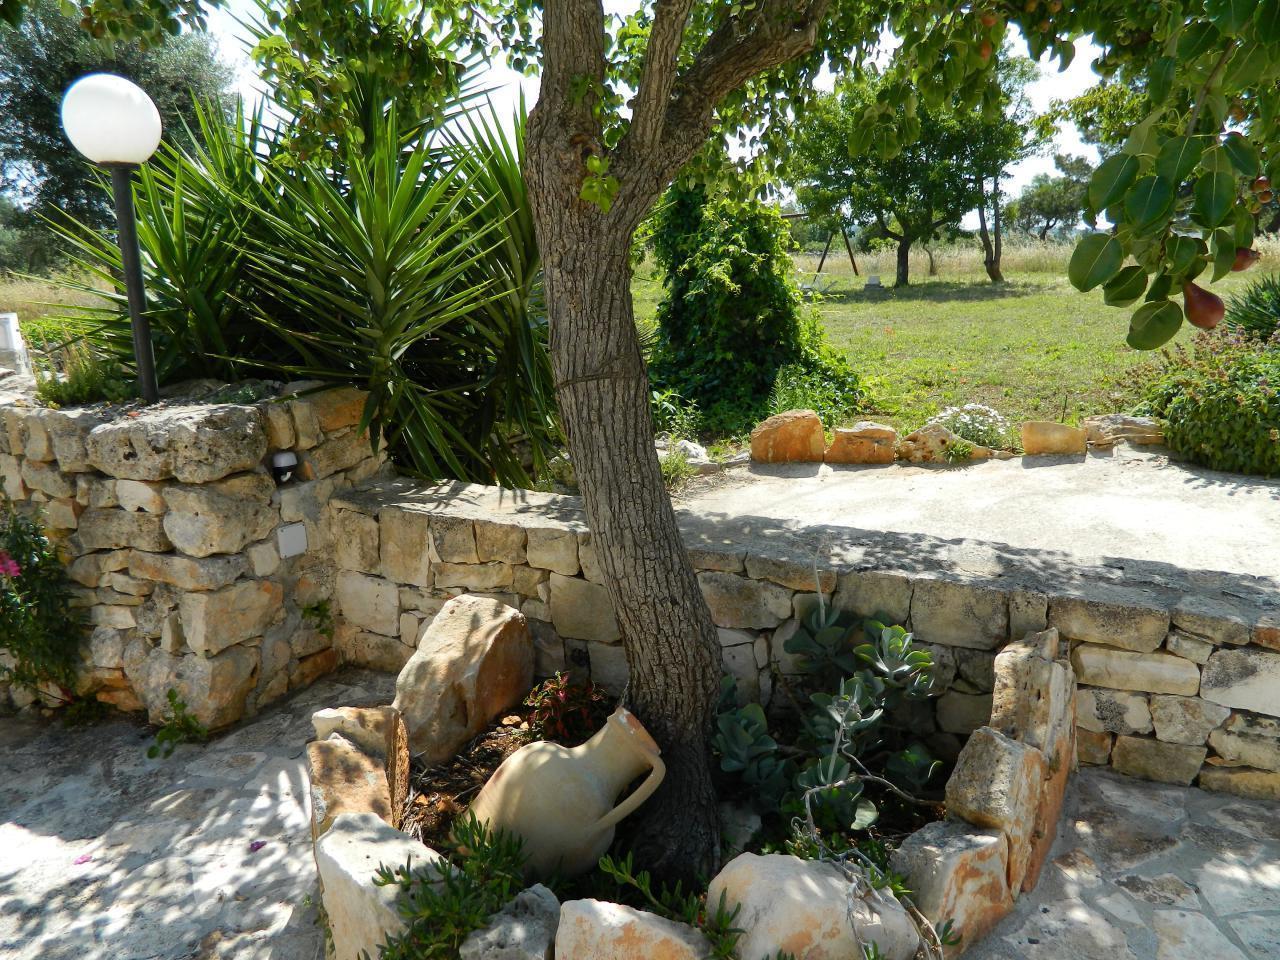 Ferienhaus CASA VACANZA QUATTRO TRULLI A OSTUNI ALTO SALENTO PUGLIA (382942), Ostuni, Adriaküste (Apulien), Apulien, Italien, Bild 3